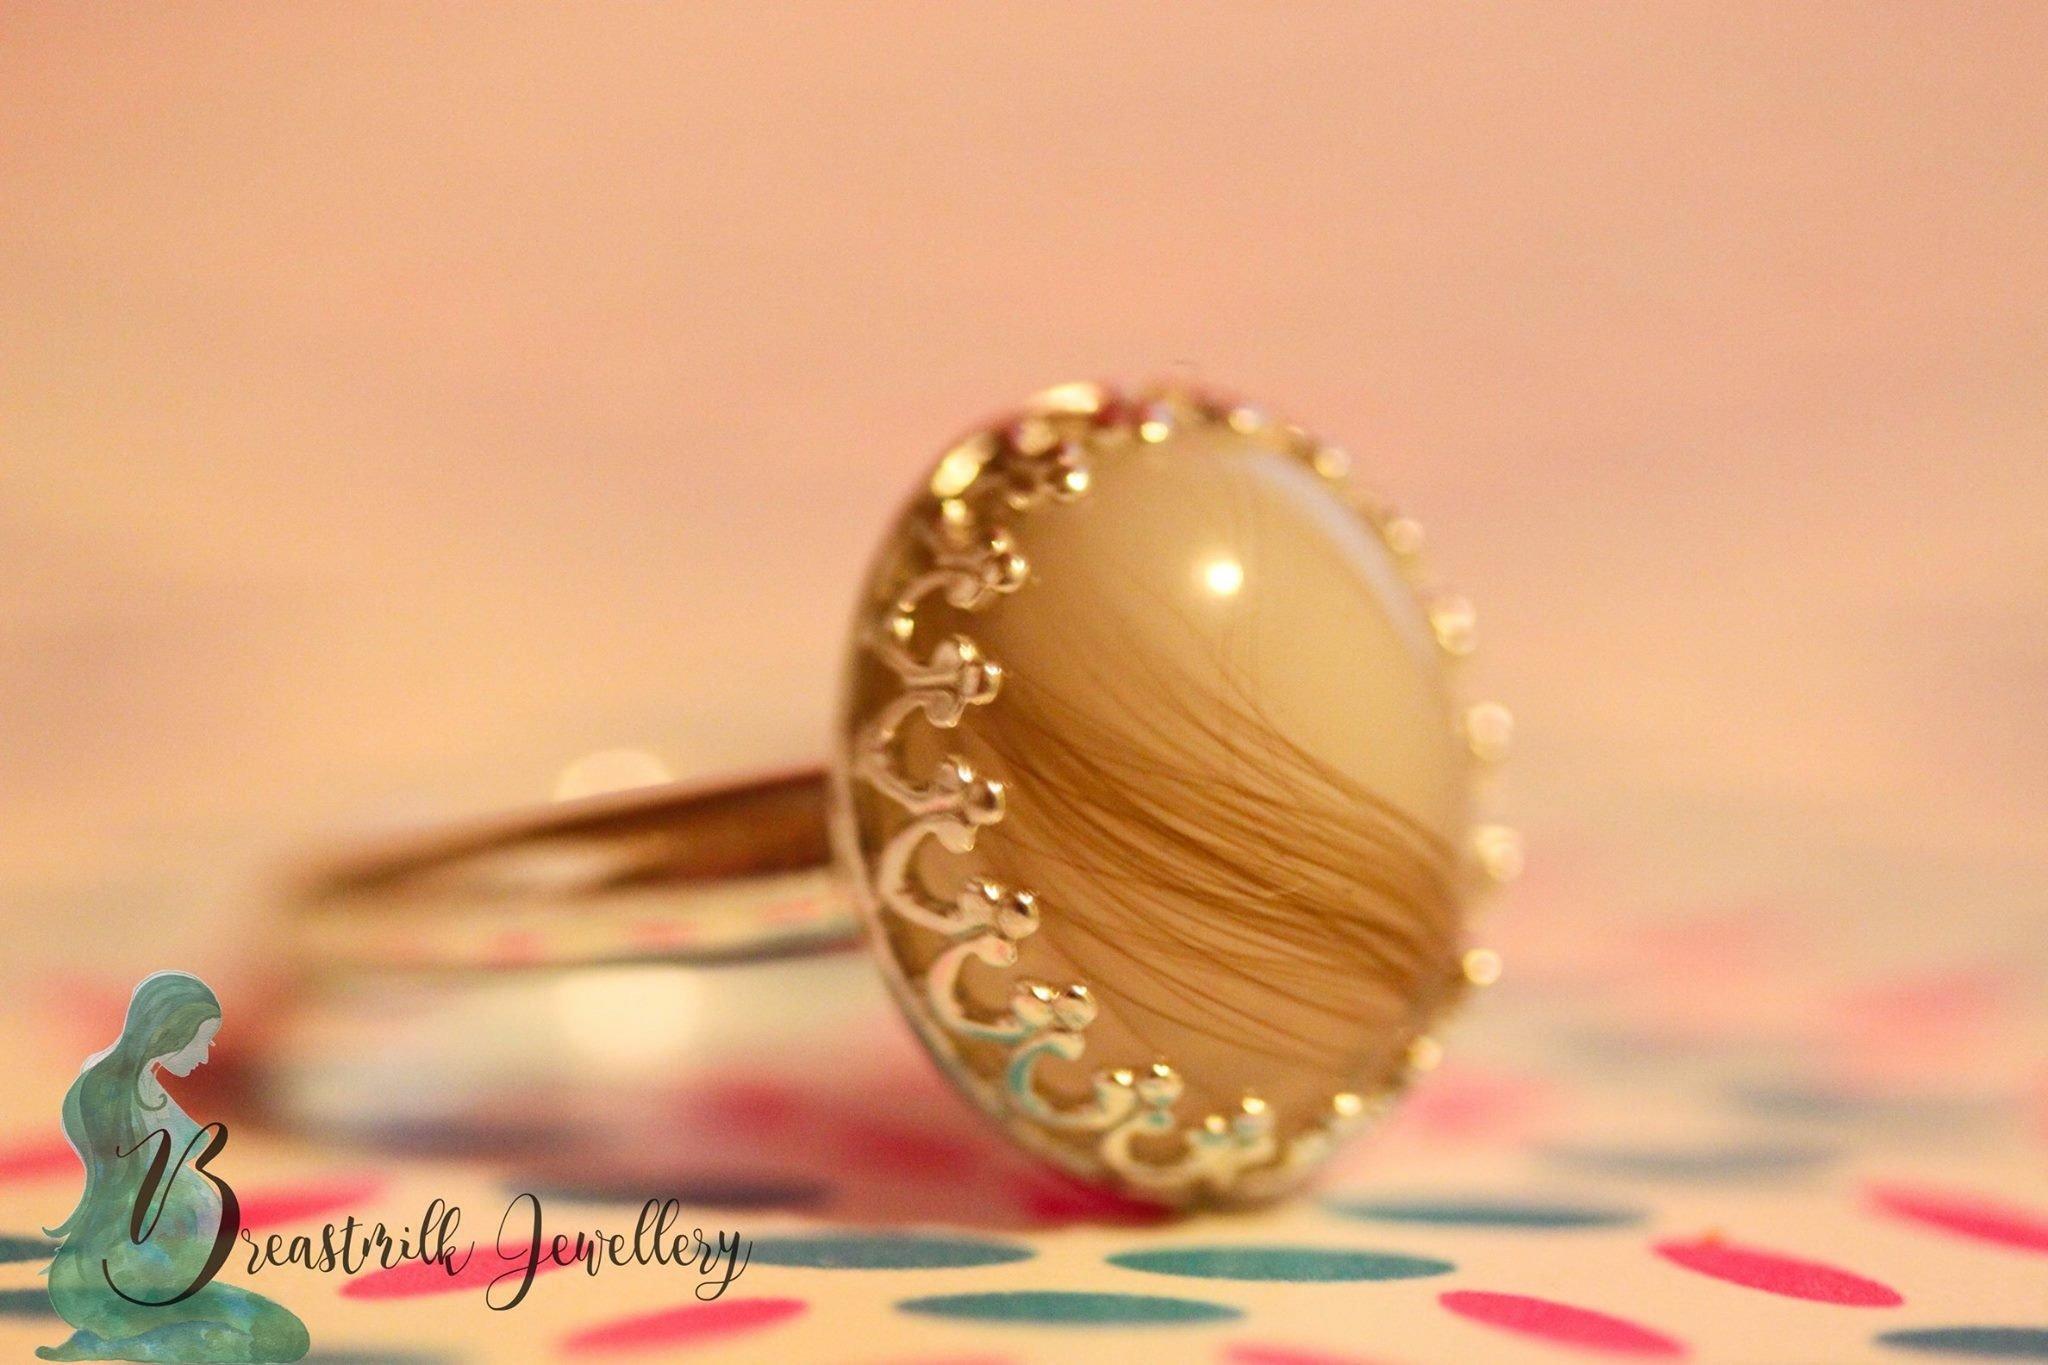 Breastmilk~jewellery